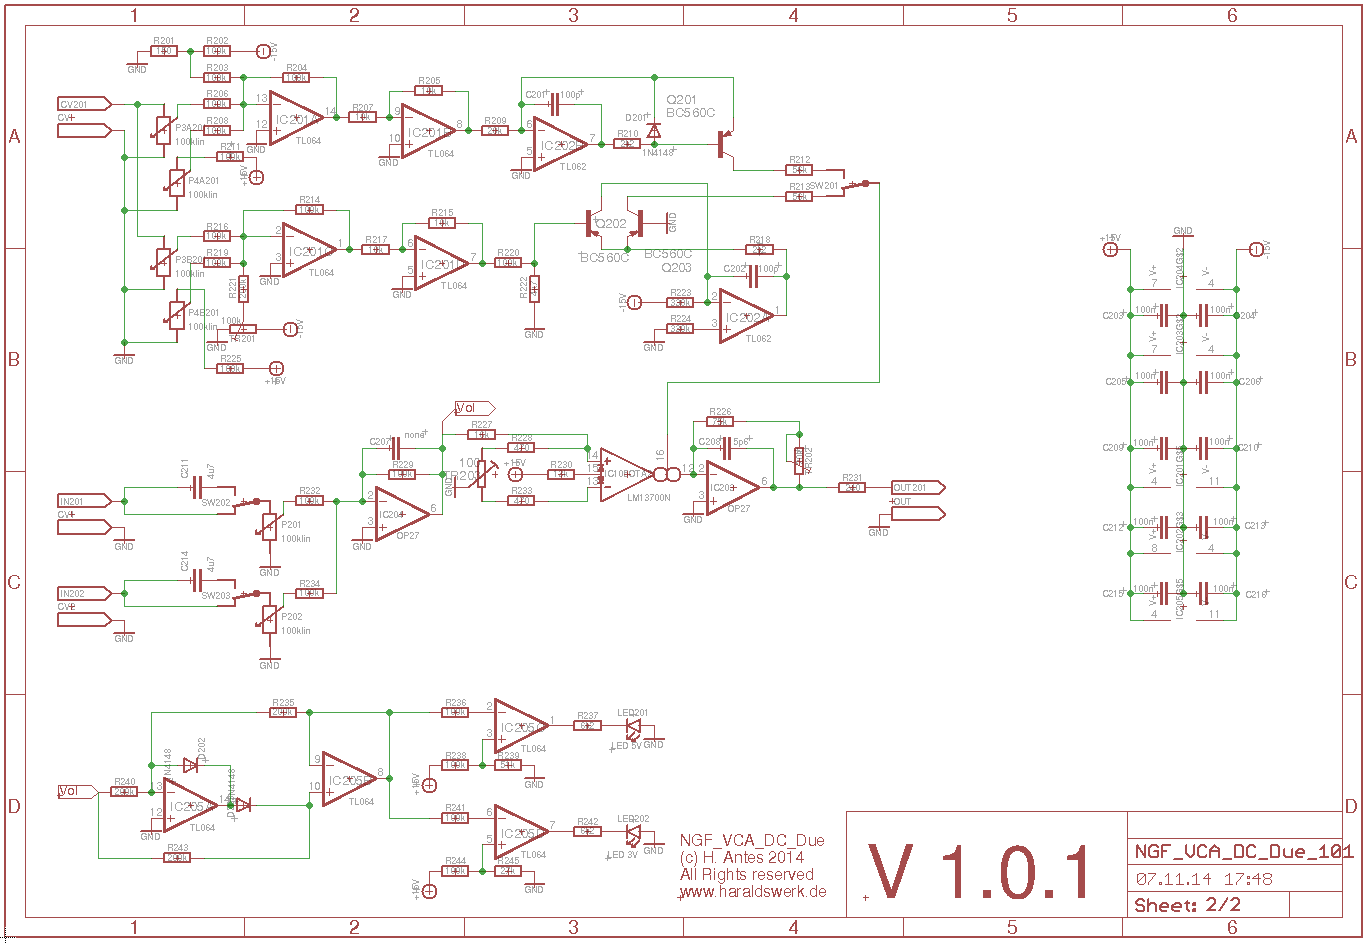 Ota Vca Schematic Automotive Wiring Diagram Motordriverschematic Ngf Dc Due Www Haraldswerk De L298 Motor Driver Arduino Nano V3